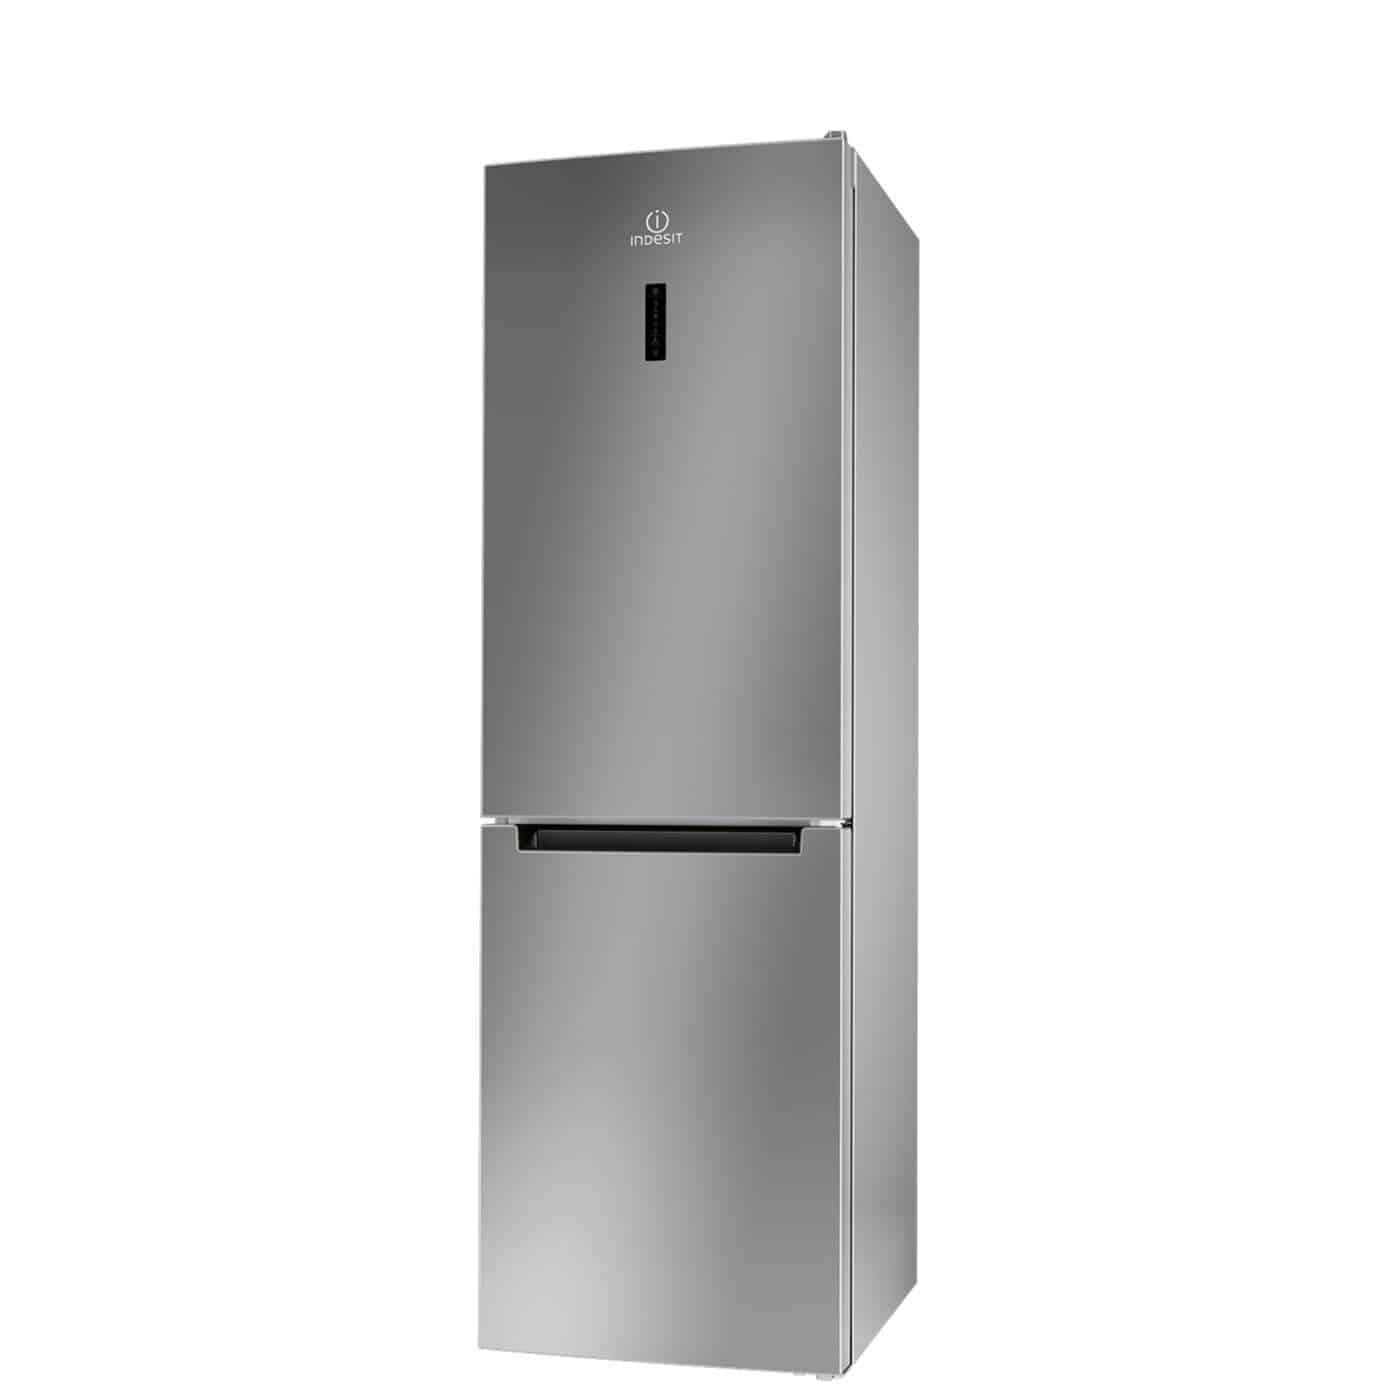 Combina frigorifica Indesit LI8 FF20 SB, 305 l, Clasa A++, H 189 cm, Silver